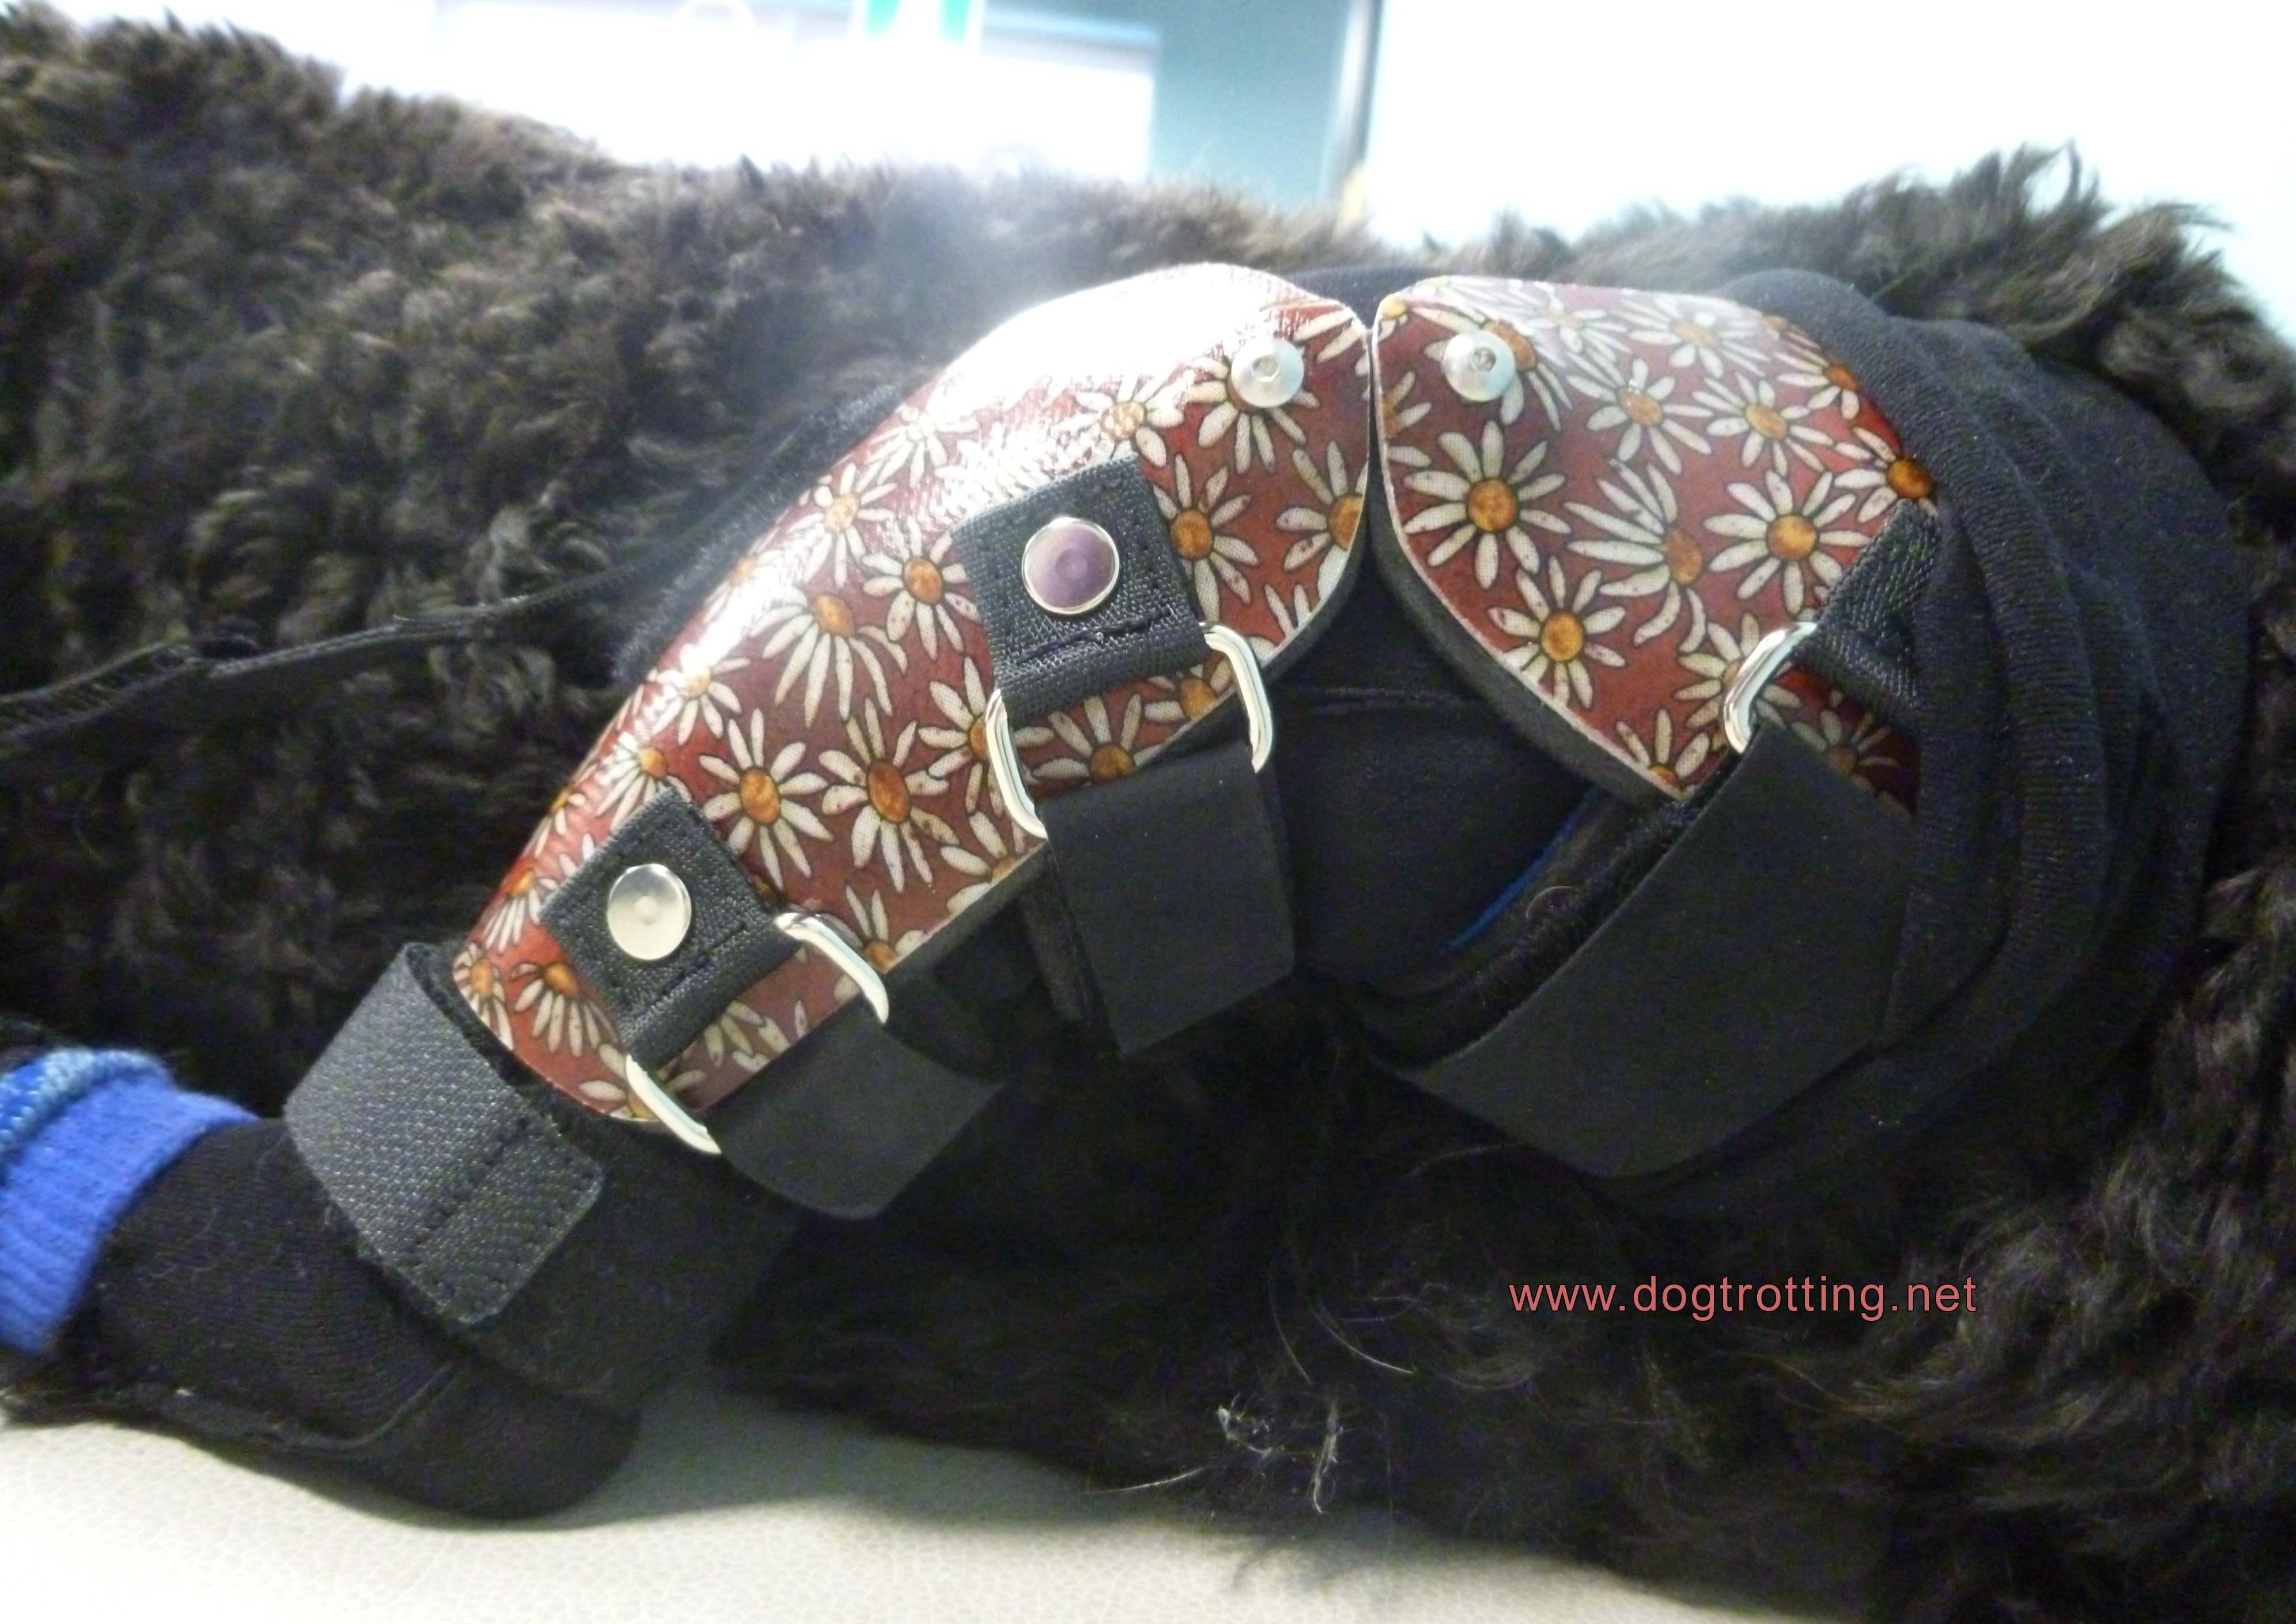 close up of dog back leg brace